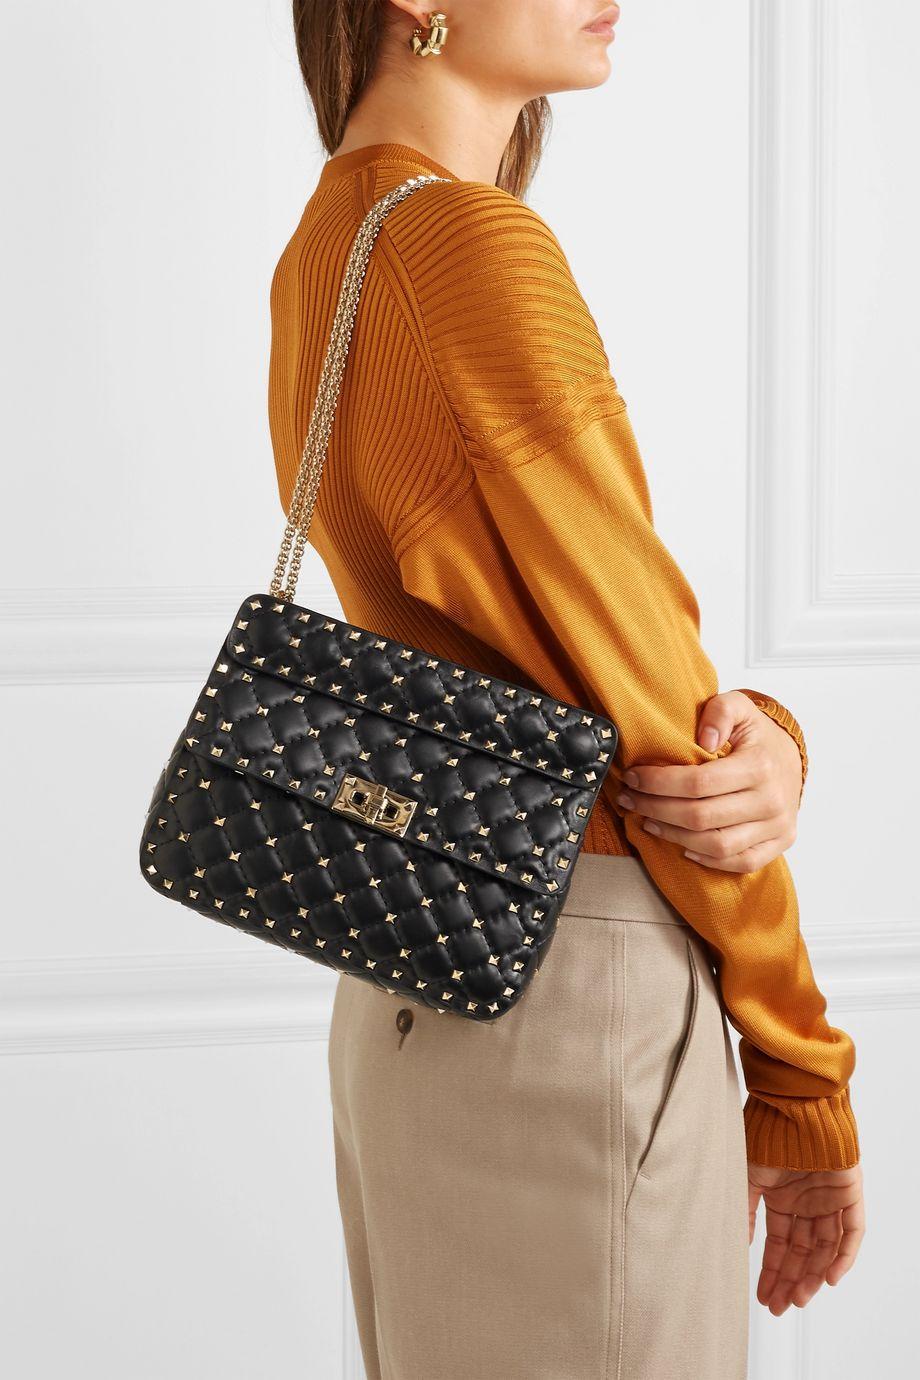 Valentino Valentino Garavani Rockstud Spike medium quilted leather shoulder bag